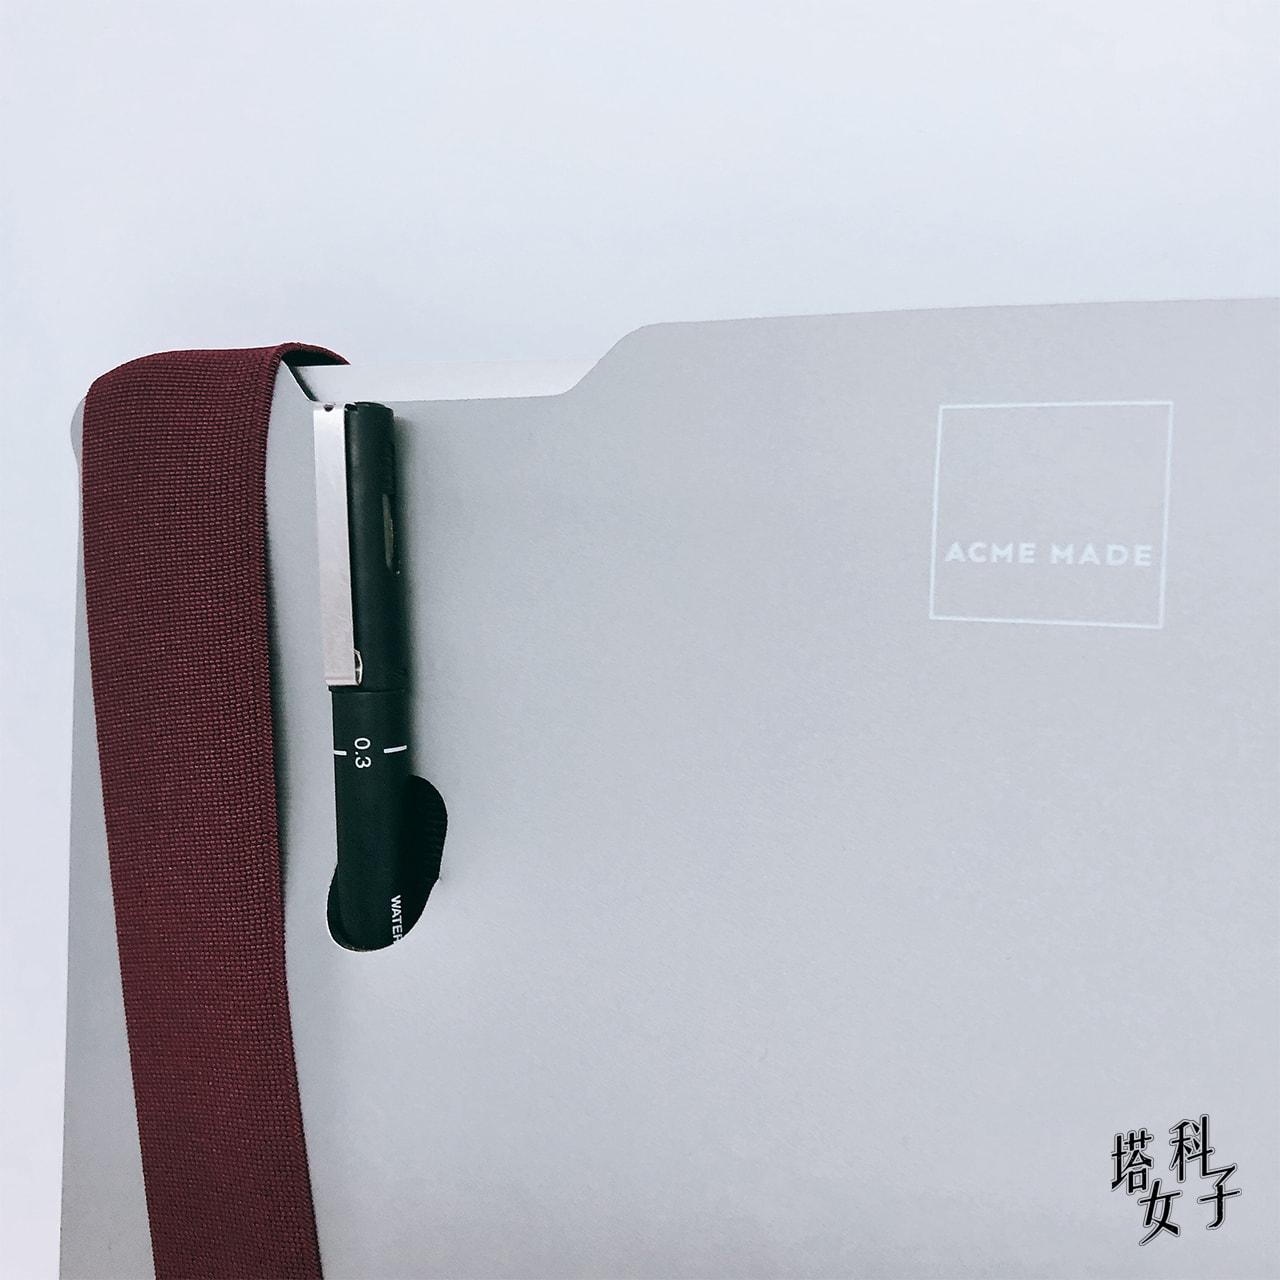 Acme Made - Skinny Sleeve 筆袋